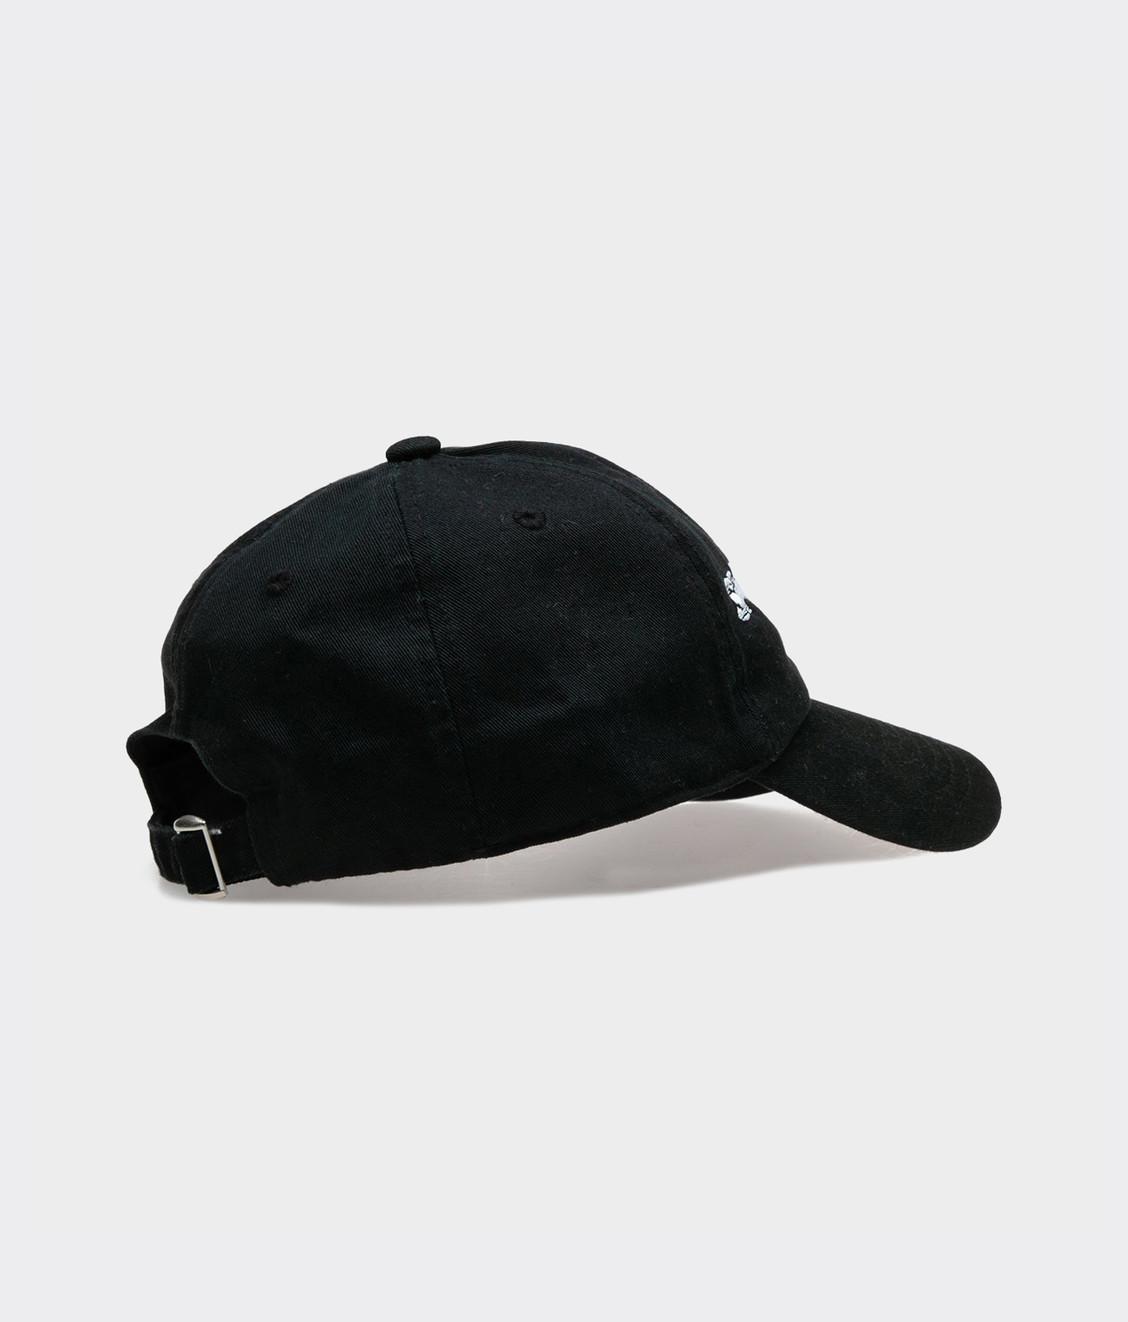 Sporty and Rich Sporty & Rich SOGH Hat Black